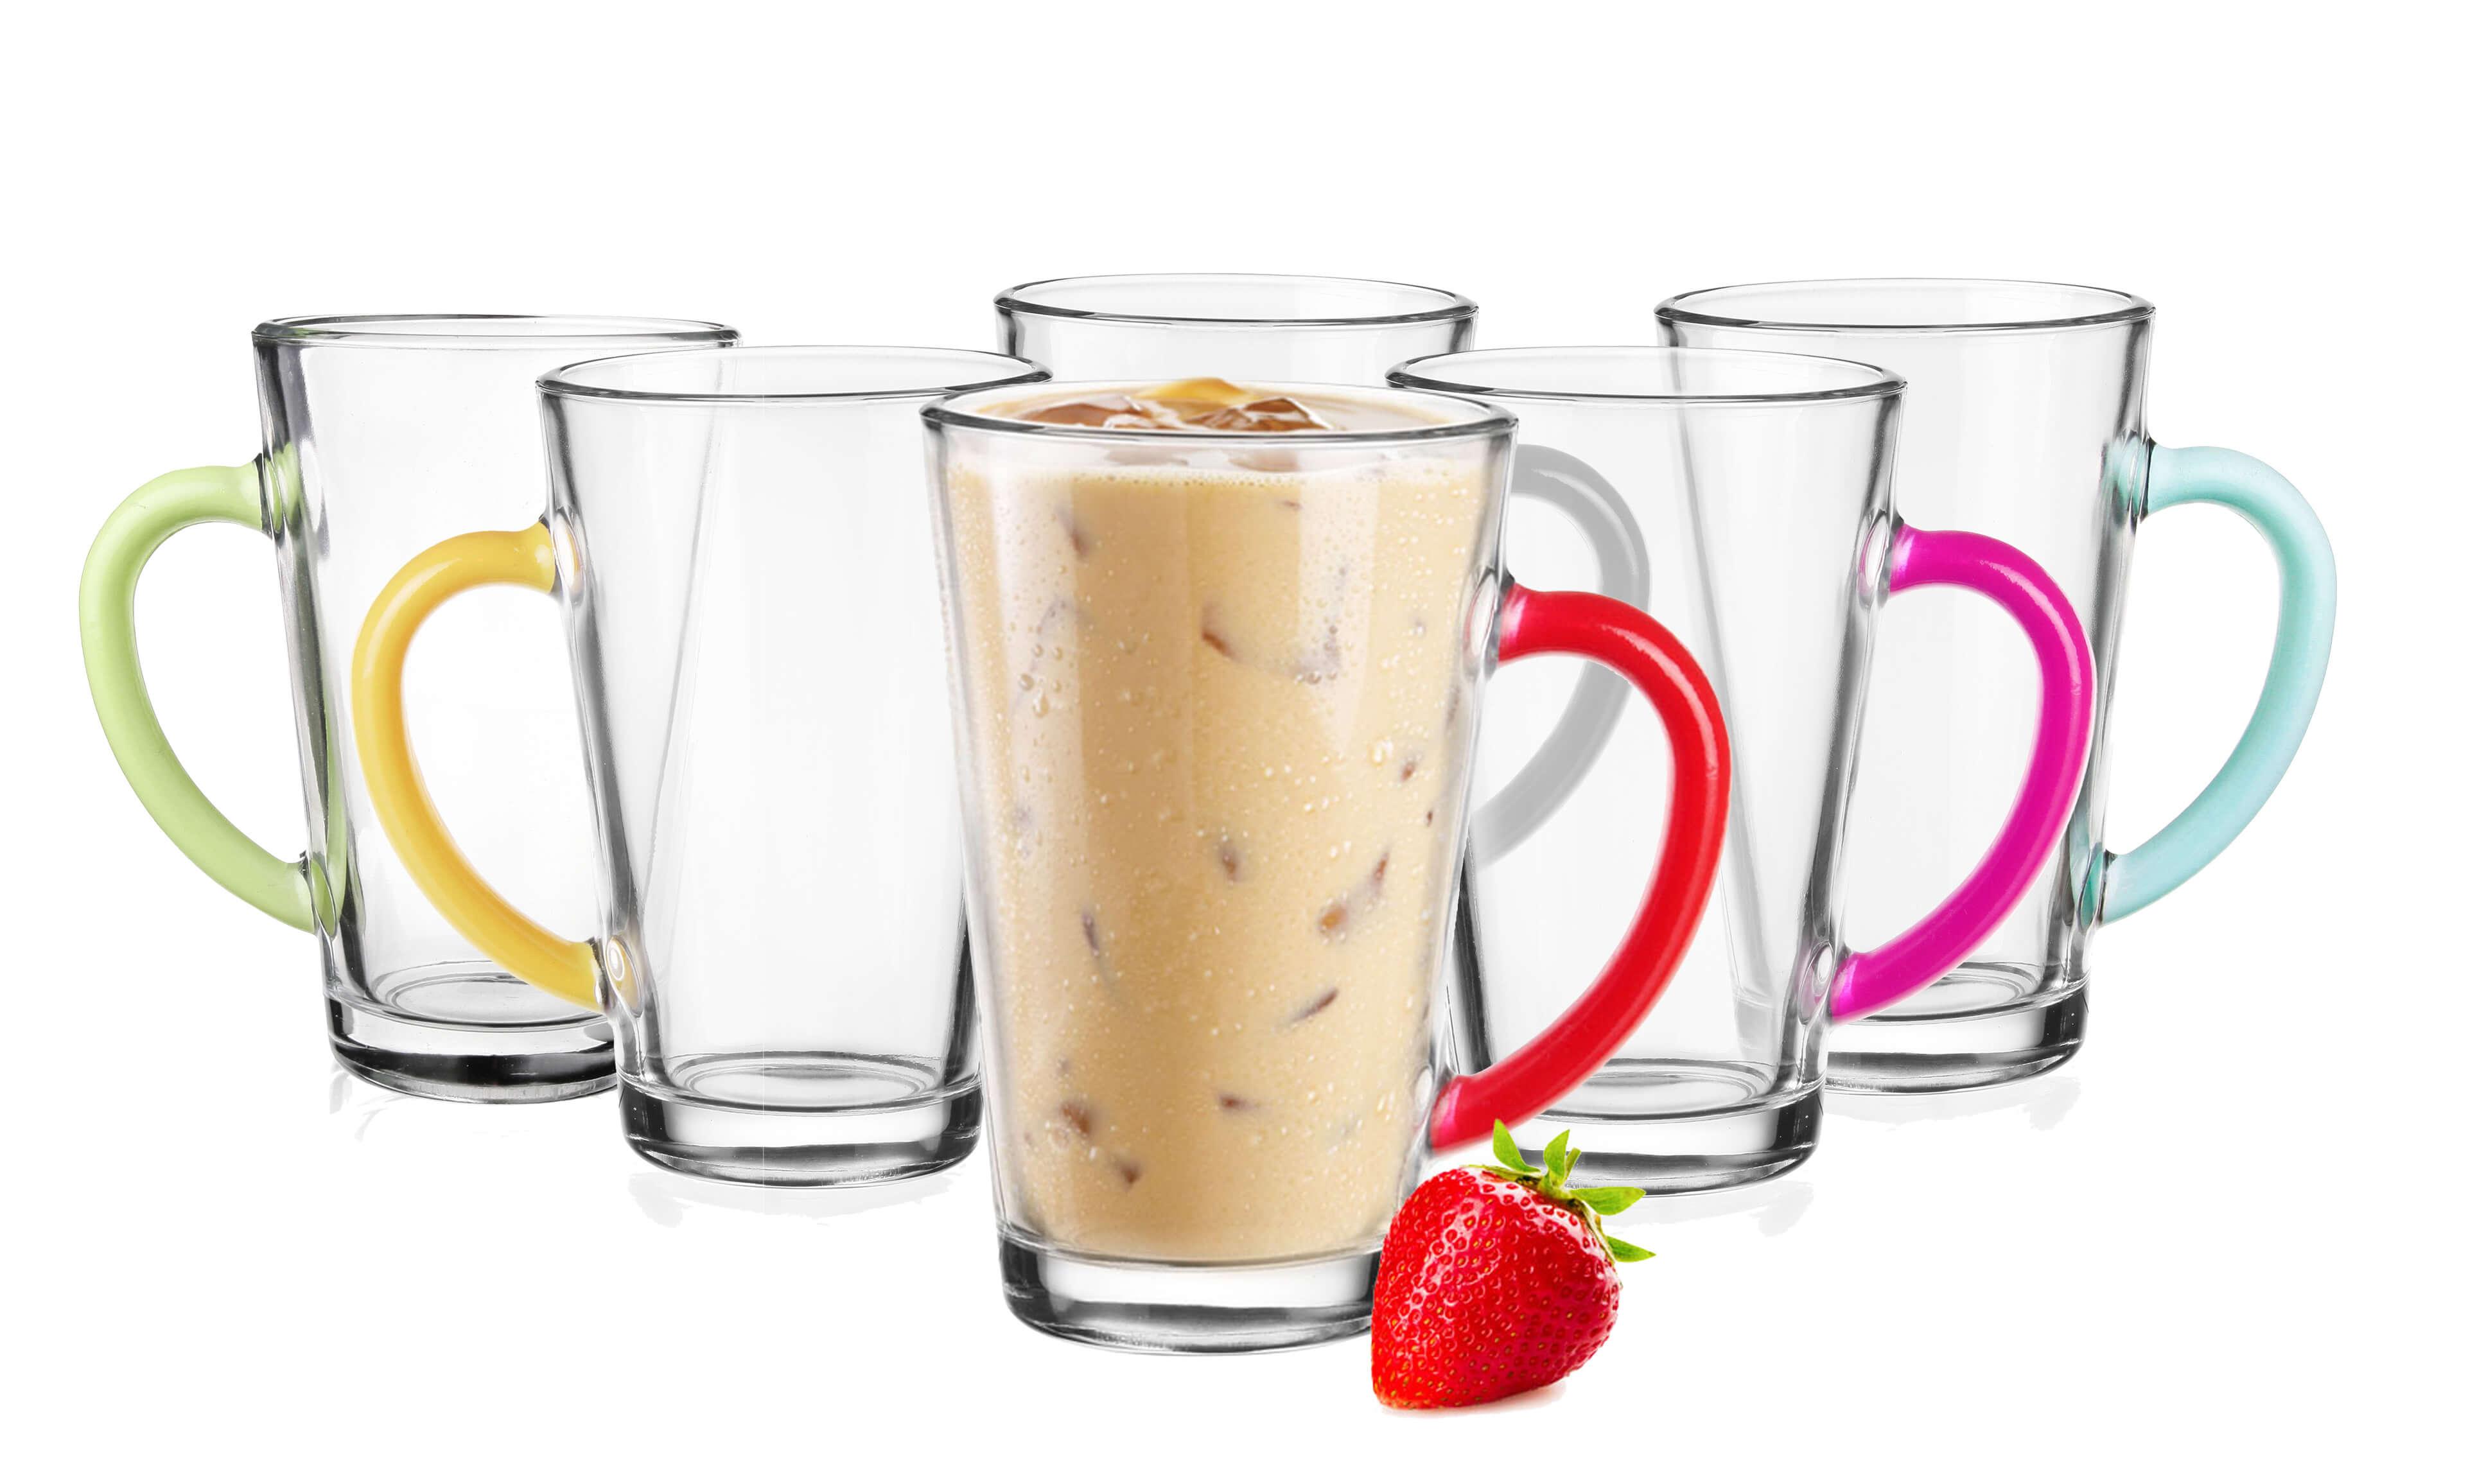 6 latte macchiato glasses 300ml with colourful henkel 6 spoons free coffee glasses ebay. Black Bedroom Furniture Sets. Home Design Ideas